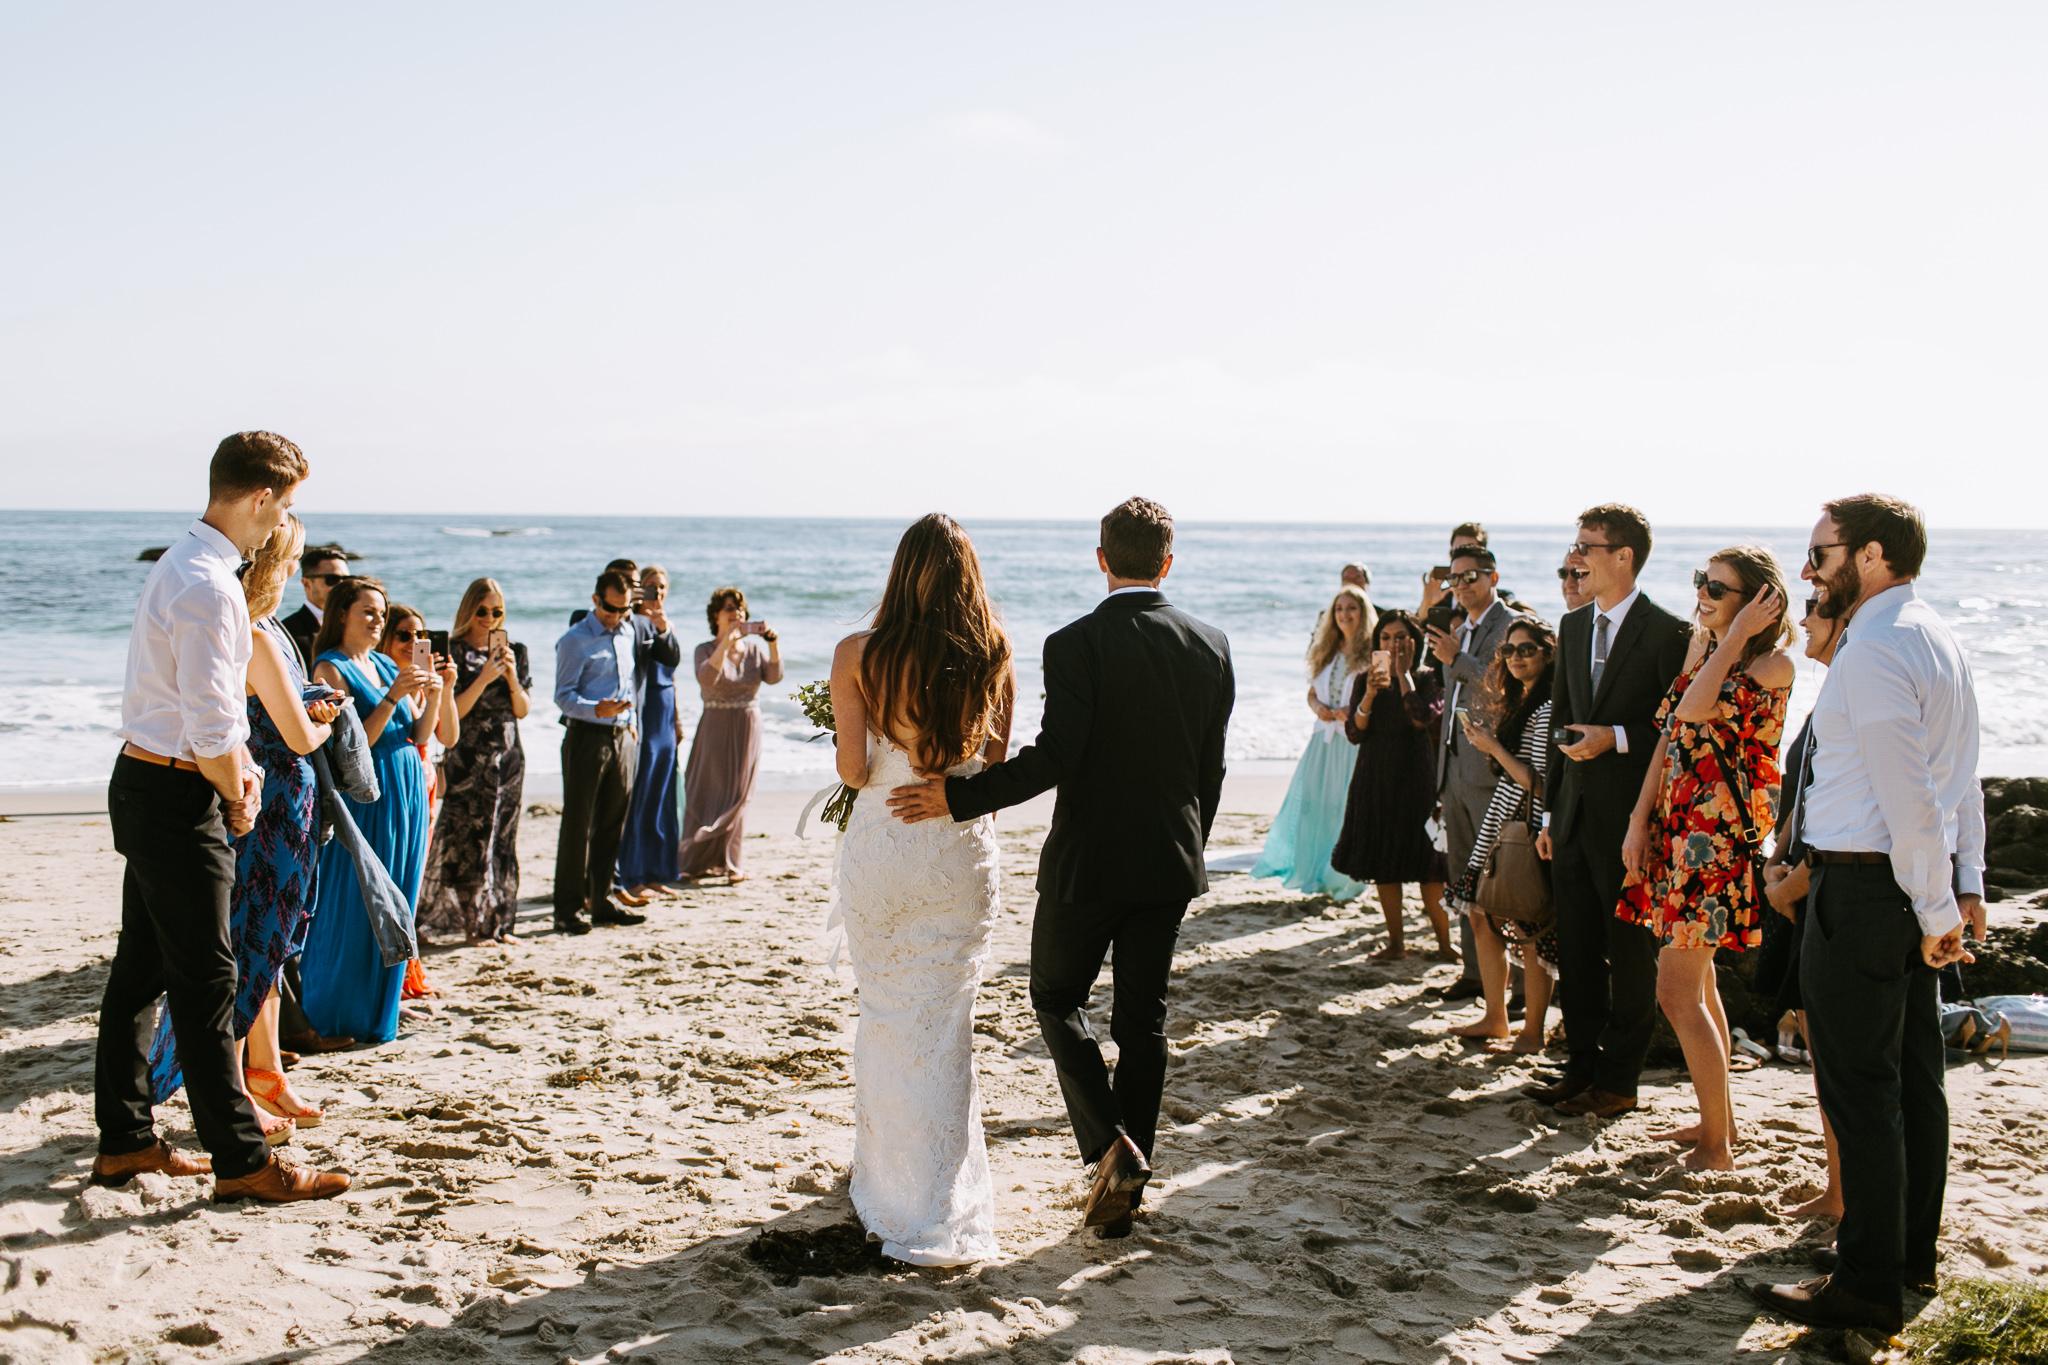 LagunaBeach-WeddingPhotographer-31.jpg